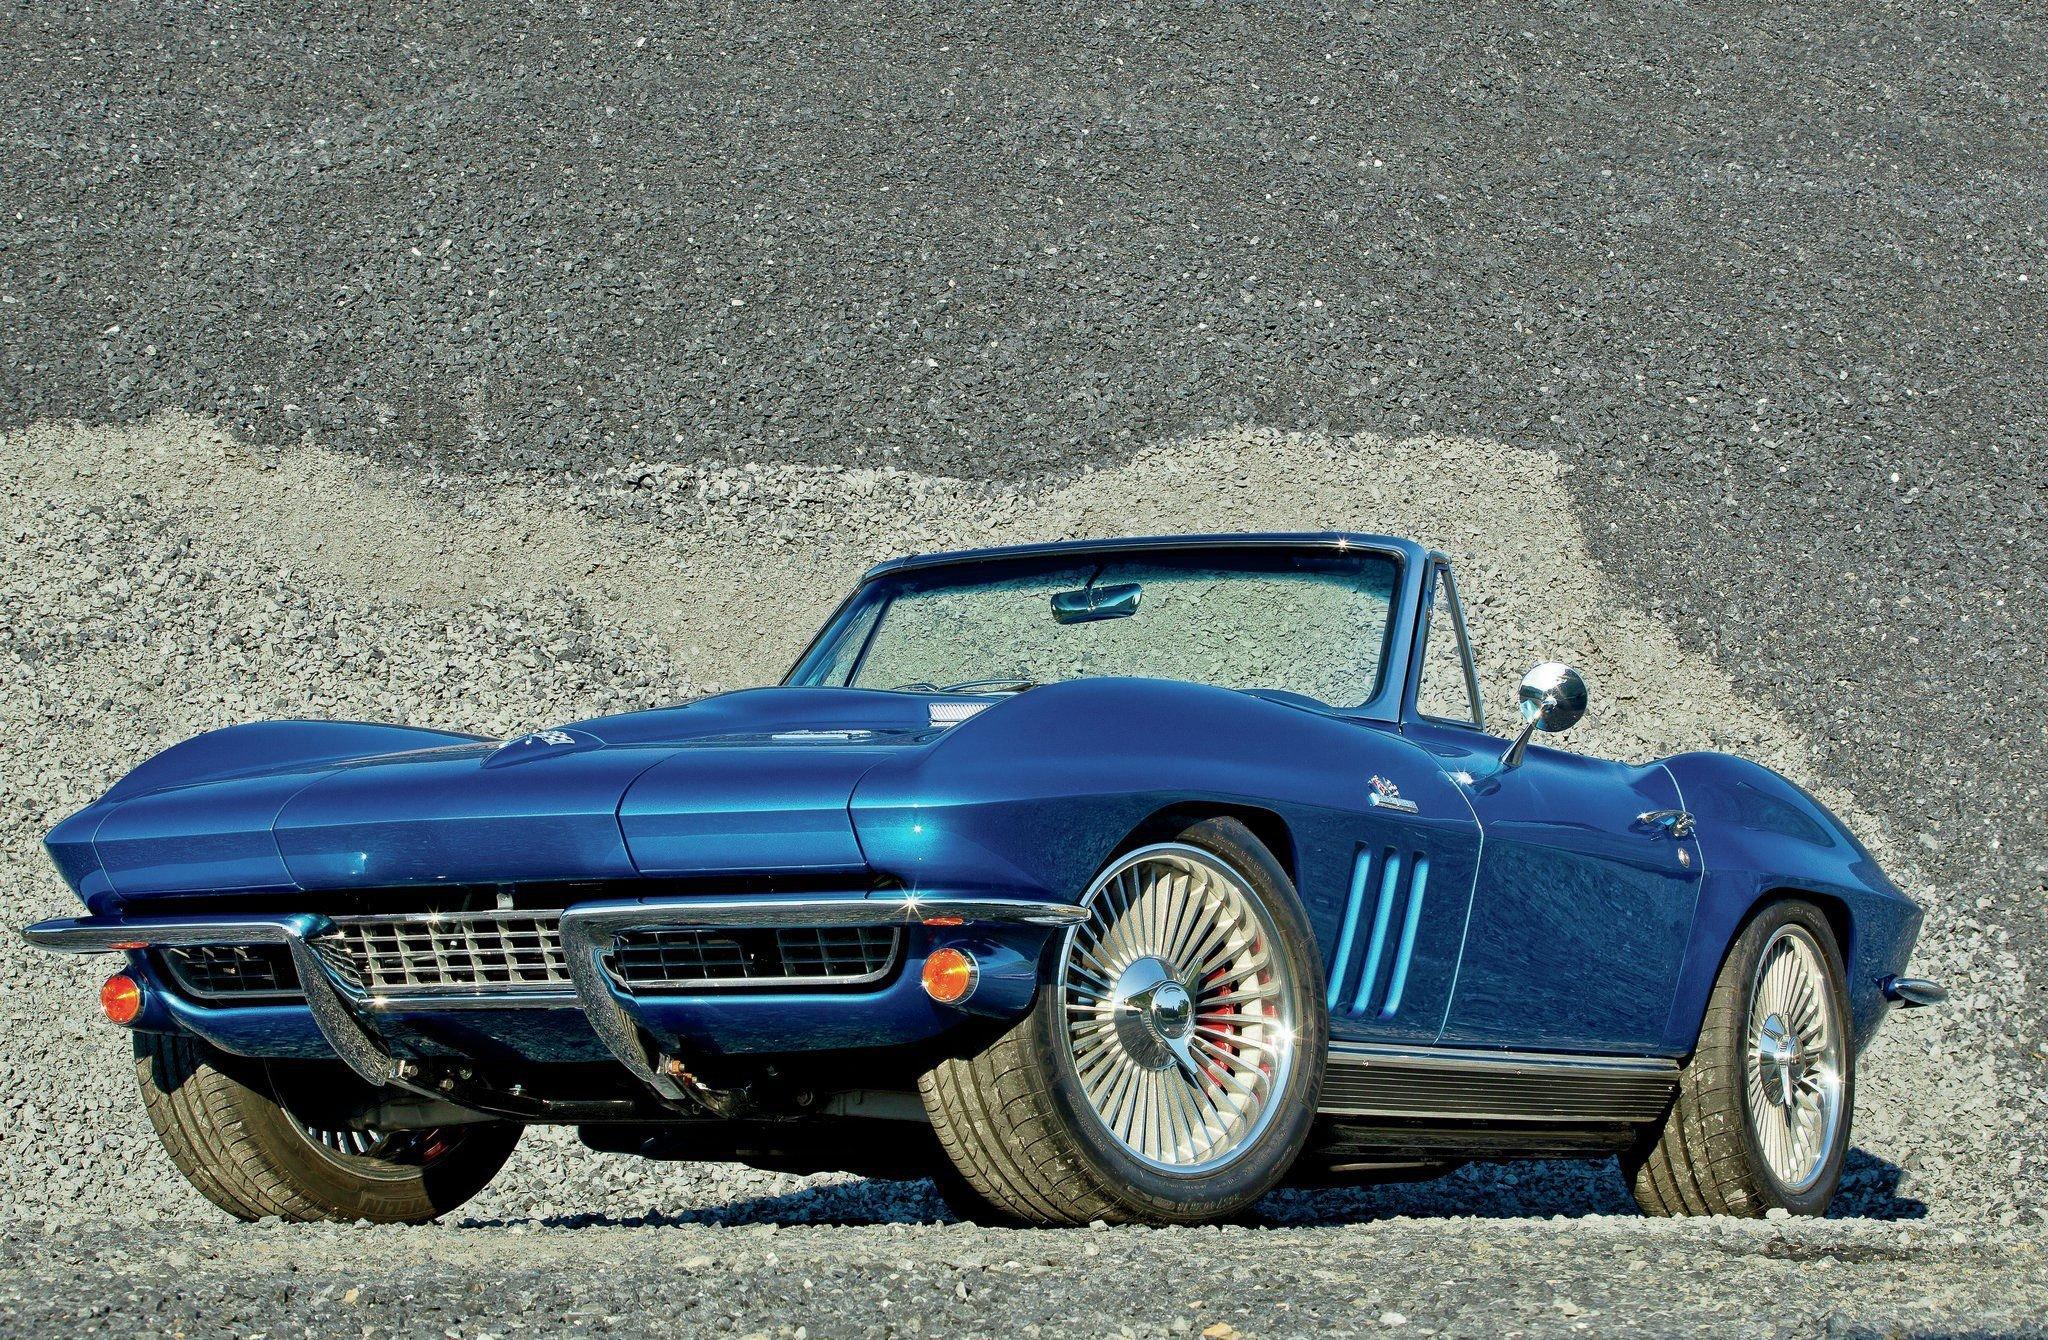 1966 Chevrolet Chevy Corvette Stingray Sting Ray Resto Mod Street Rod Usa 02 Wallpaper 2048x1340 710520 Wallpaperup